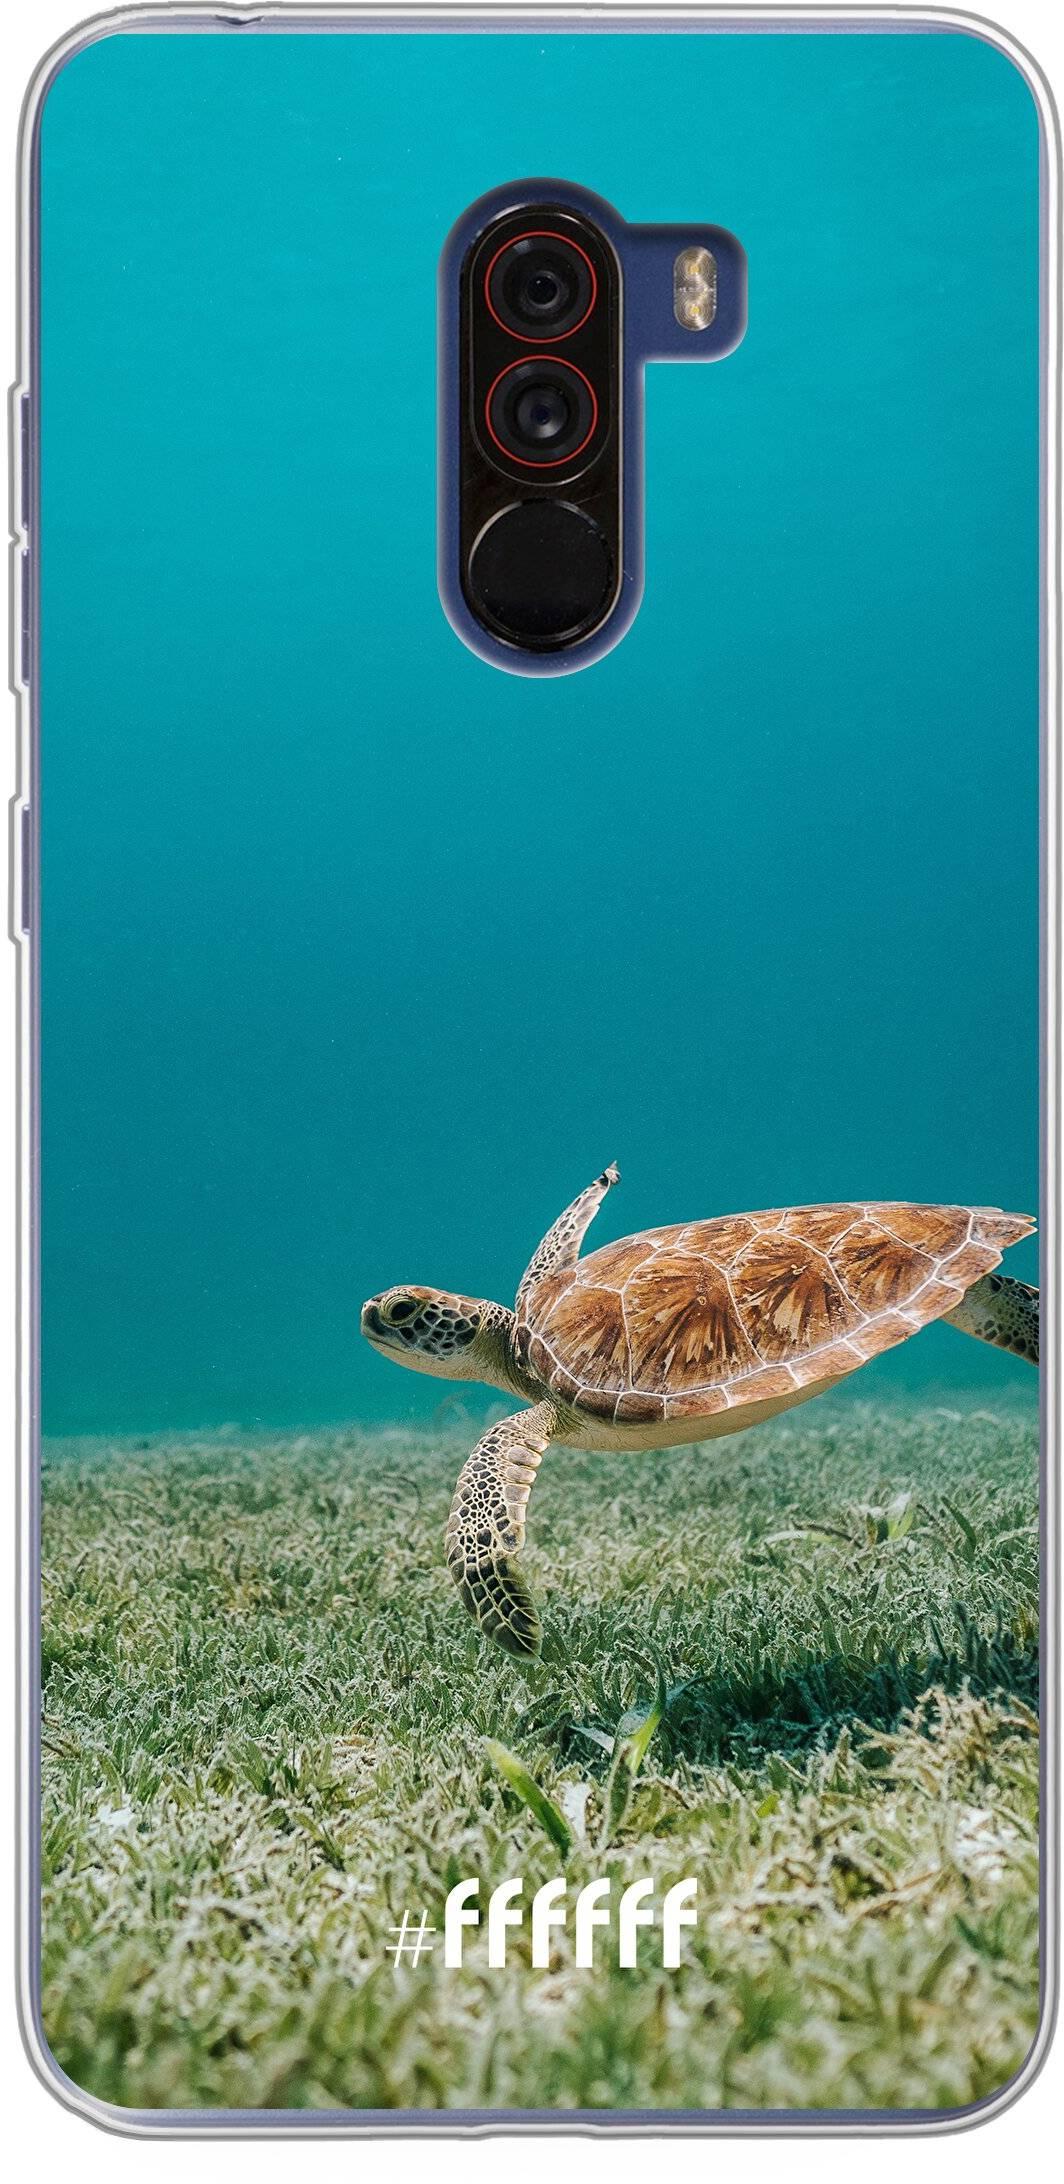 Turtle Pocophone F1